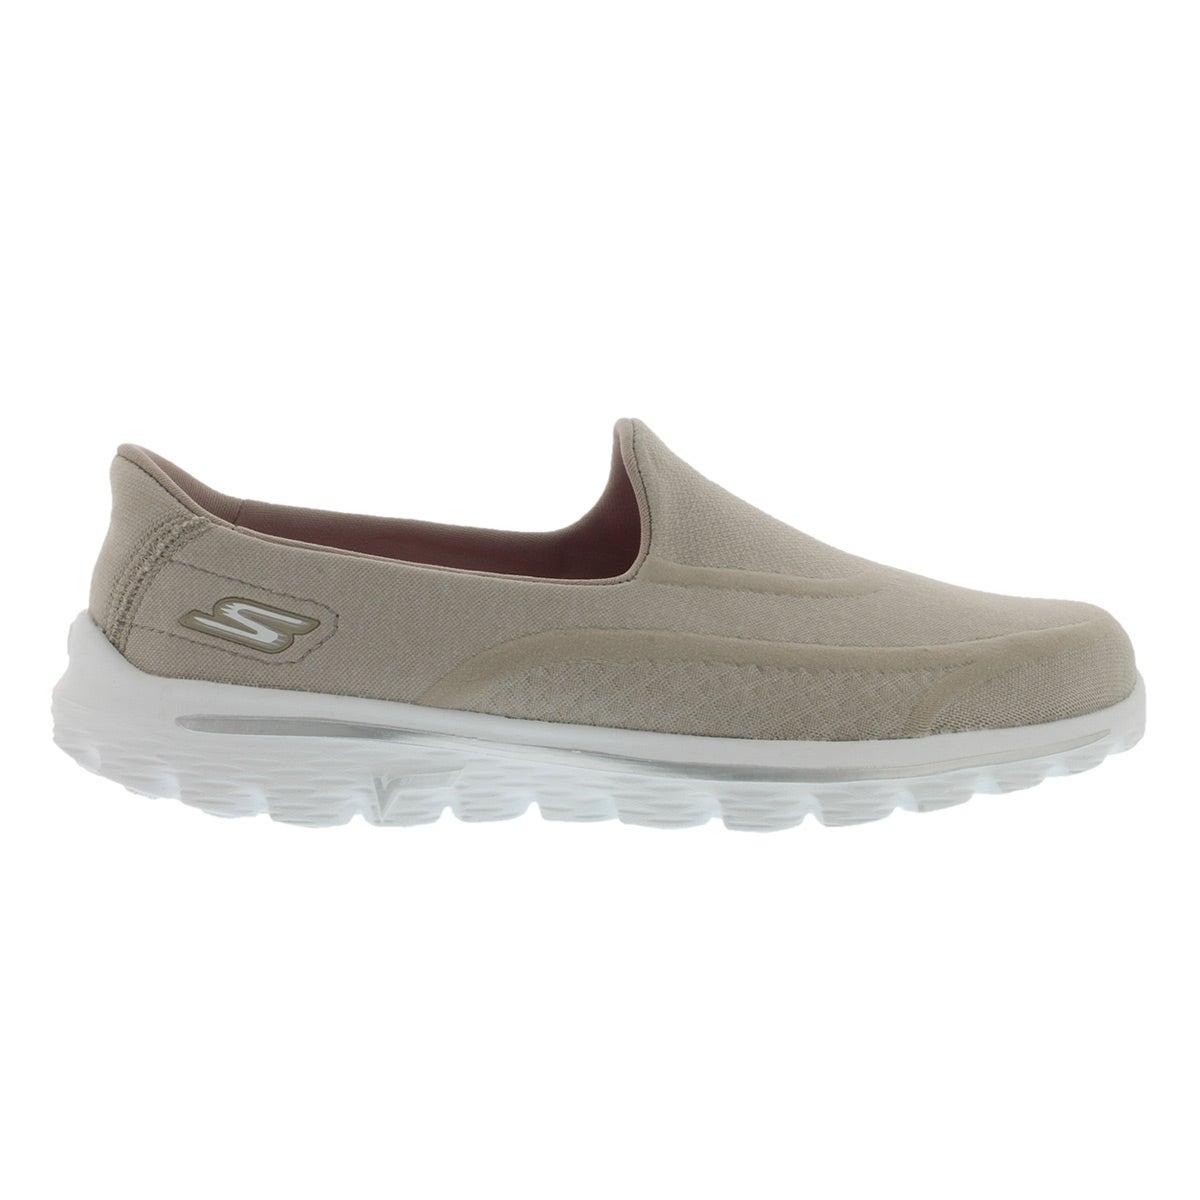 Lds GOwalk 2-Super Sock2 taupe slip on